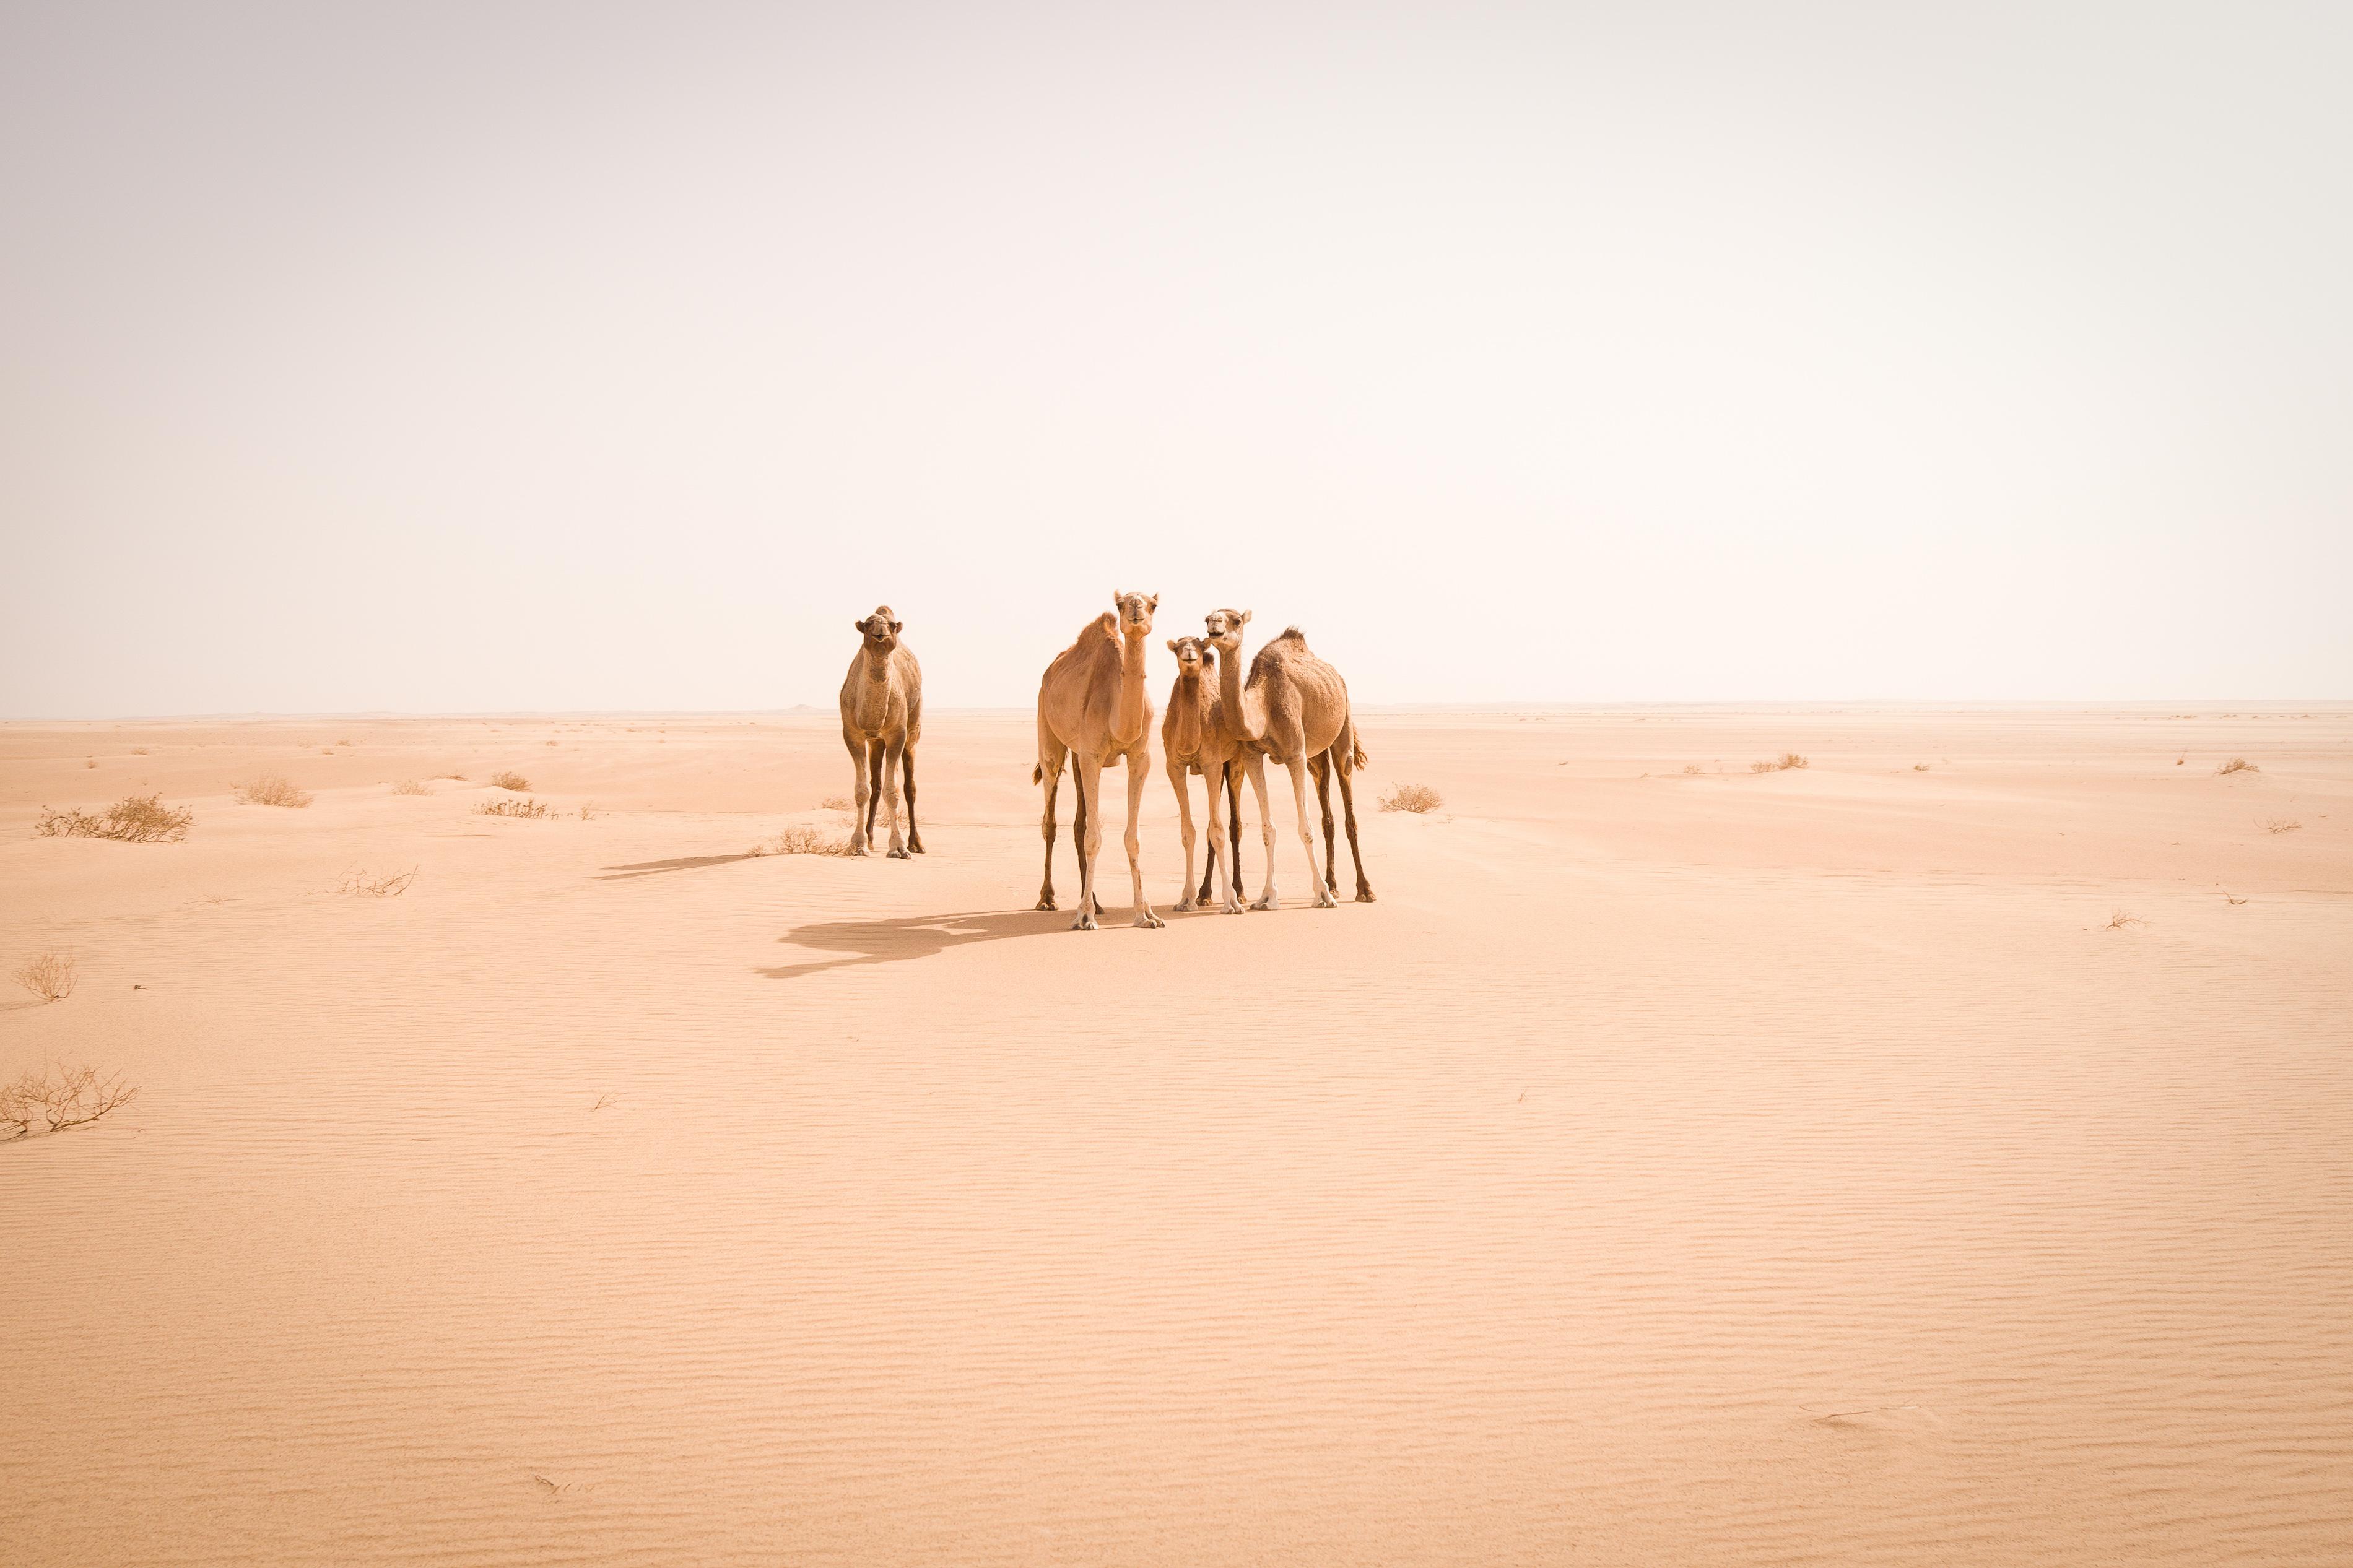 This photographer hopped freight trains through the Sahara